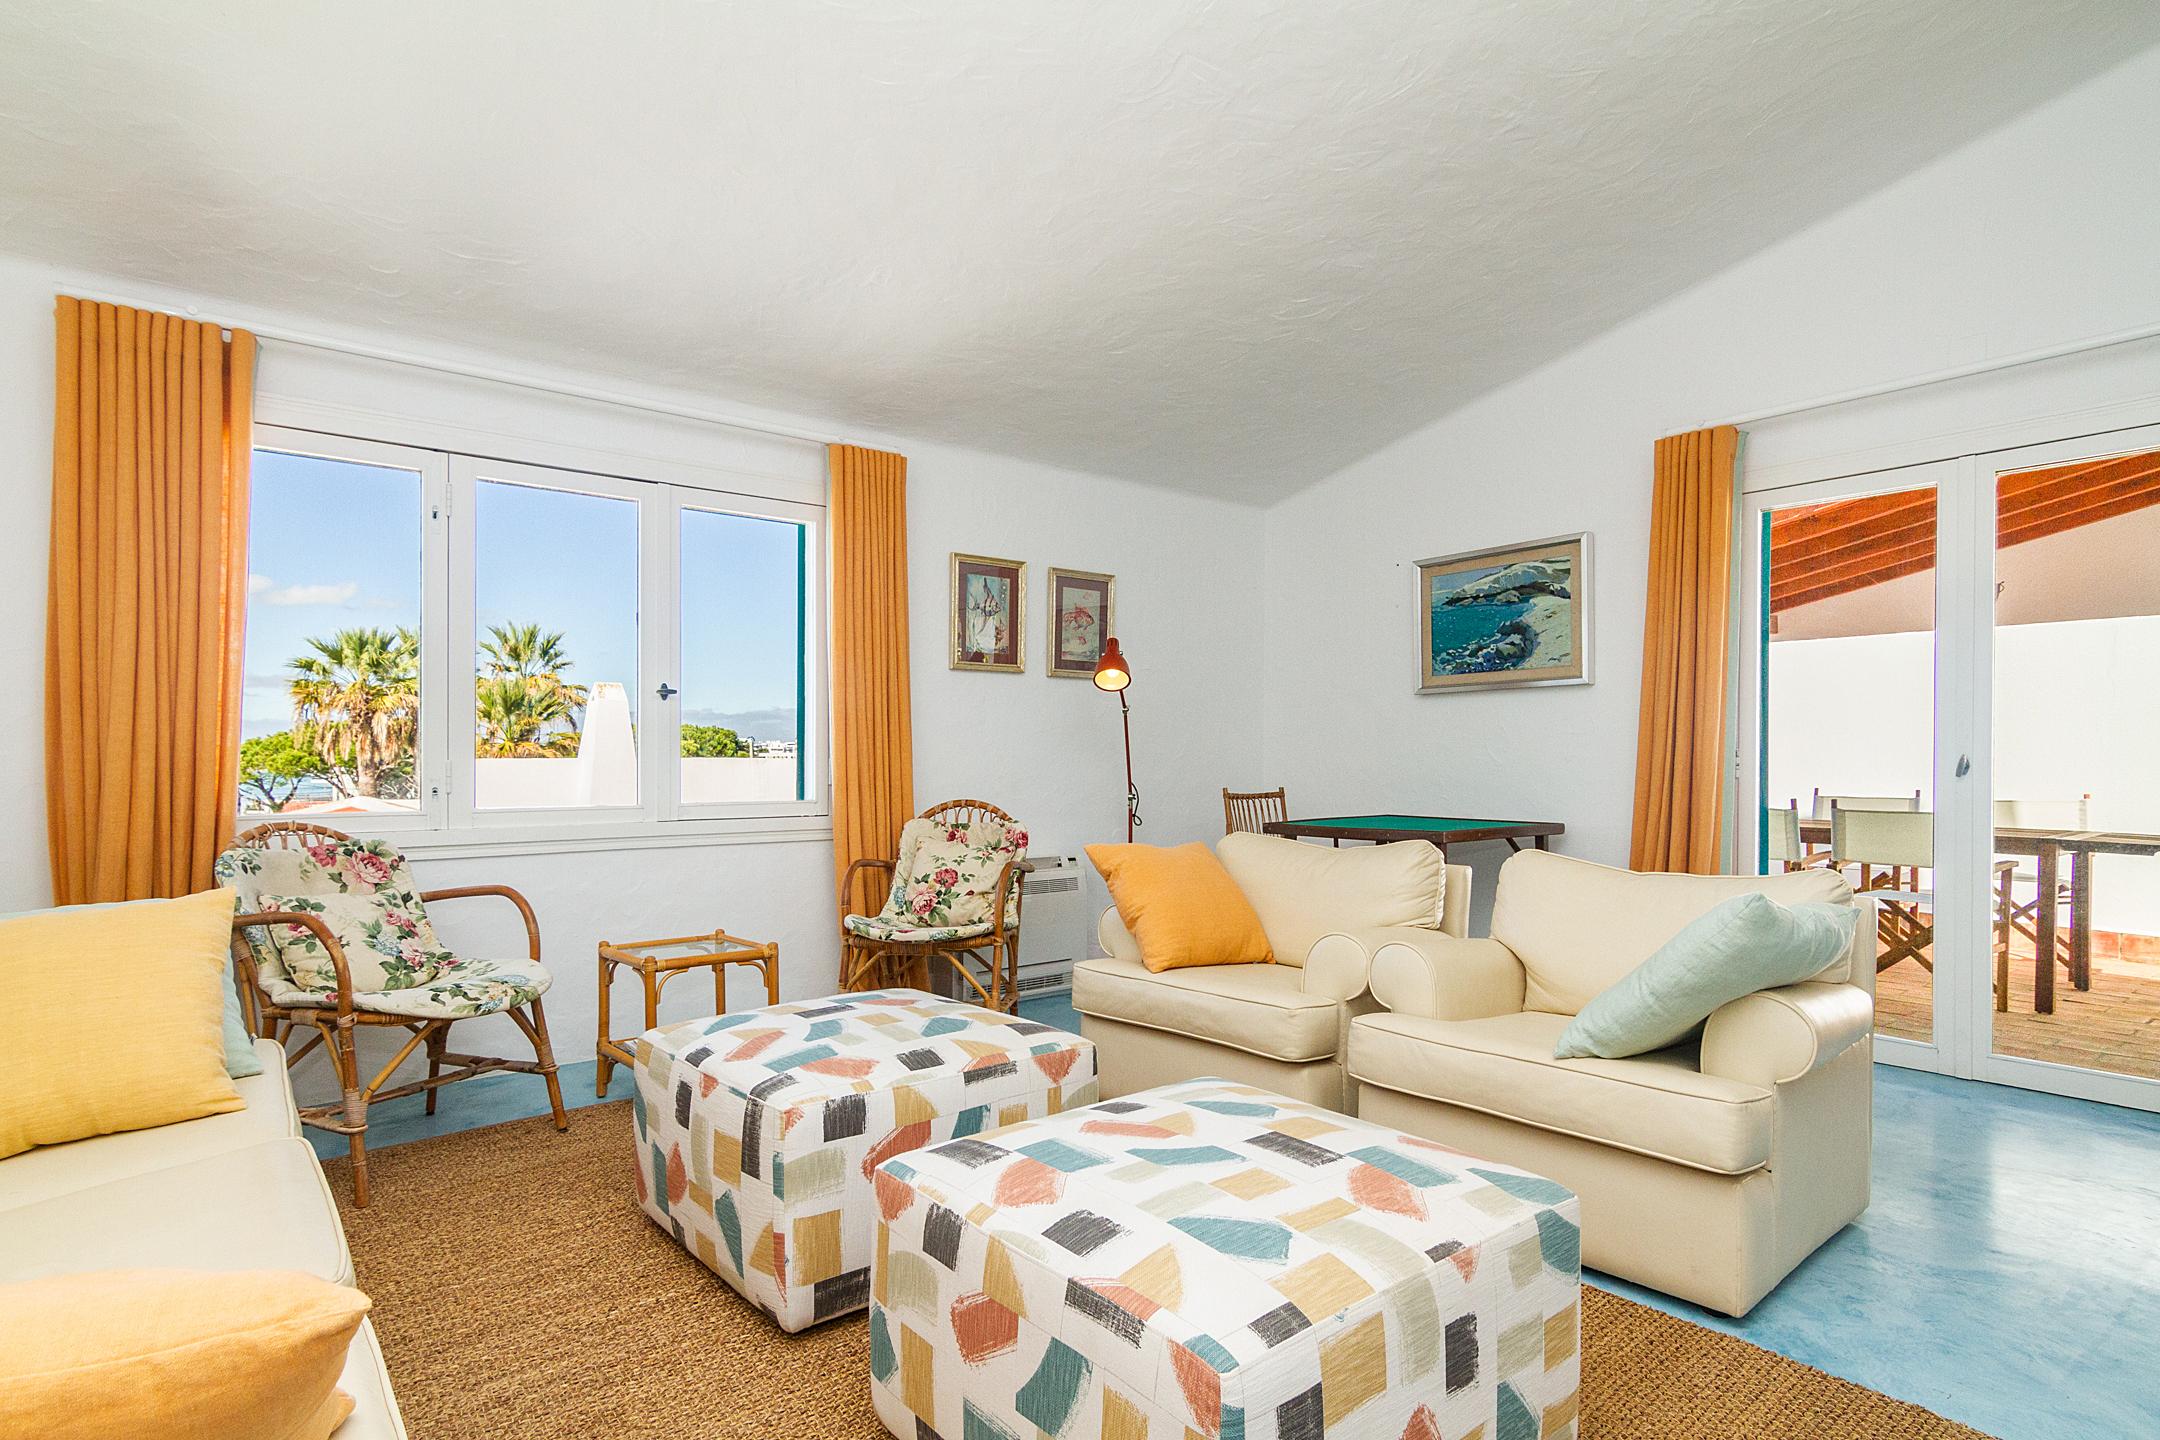 Location appartements et villas de vacance, Liiiving in Algarve | Alvor Blue Villa à Alvor, Portugal Algarve, REF_IMG_14545_14558